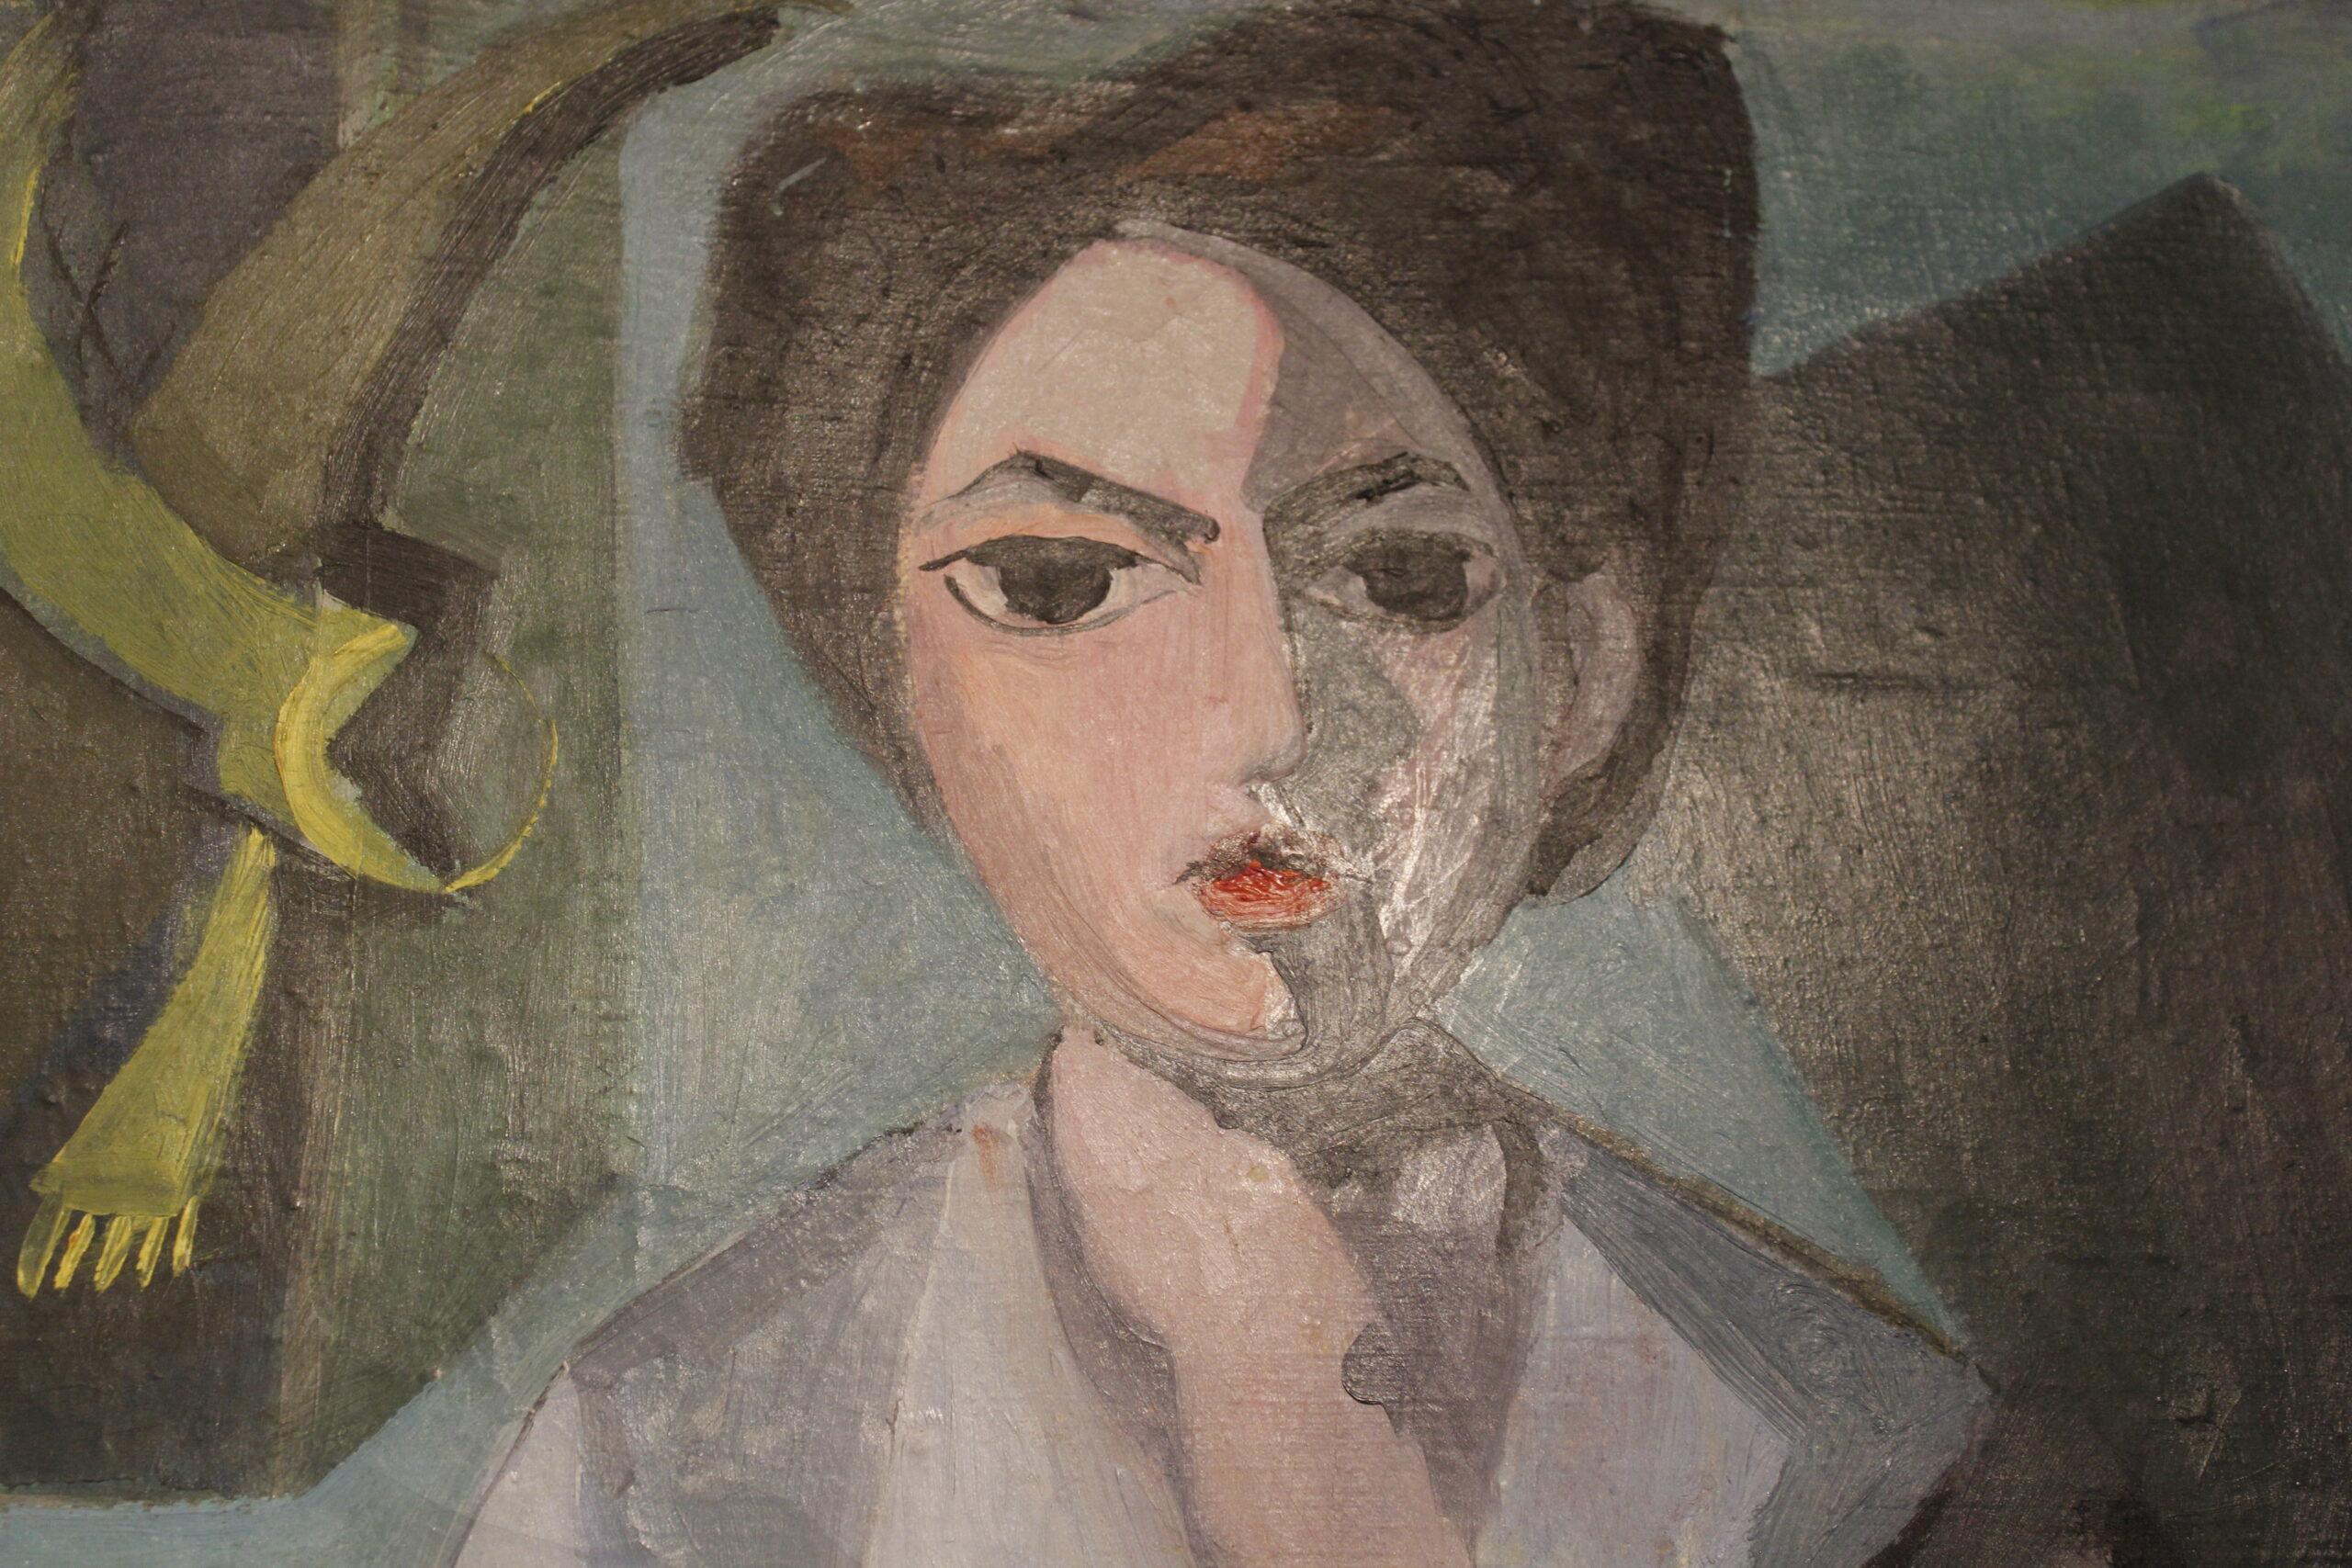 Katy Castellucci